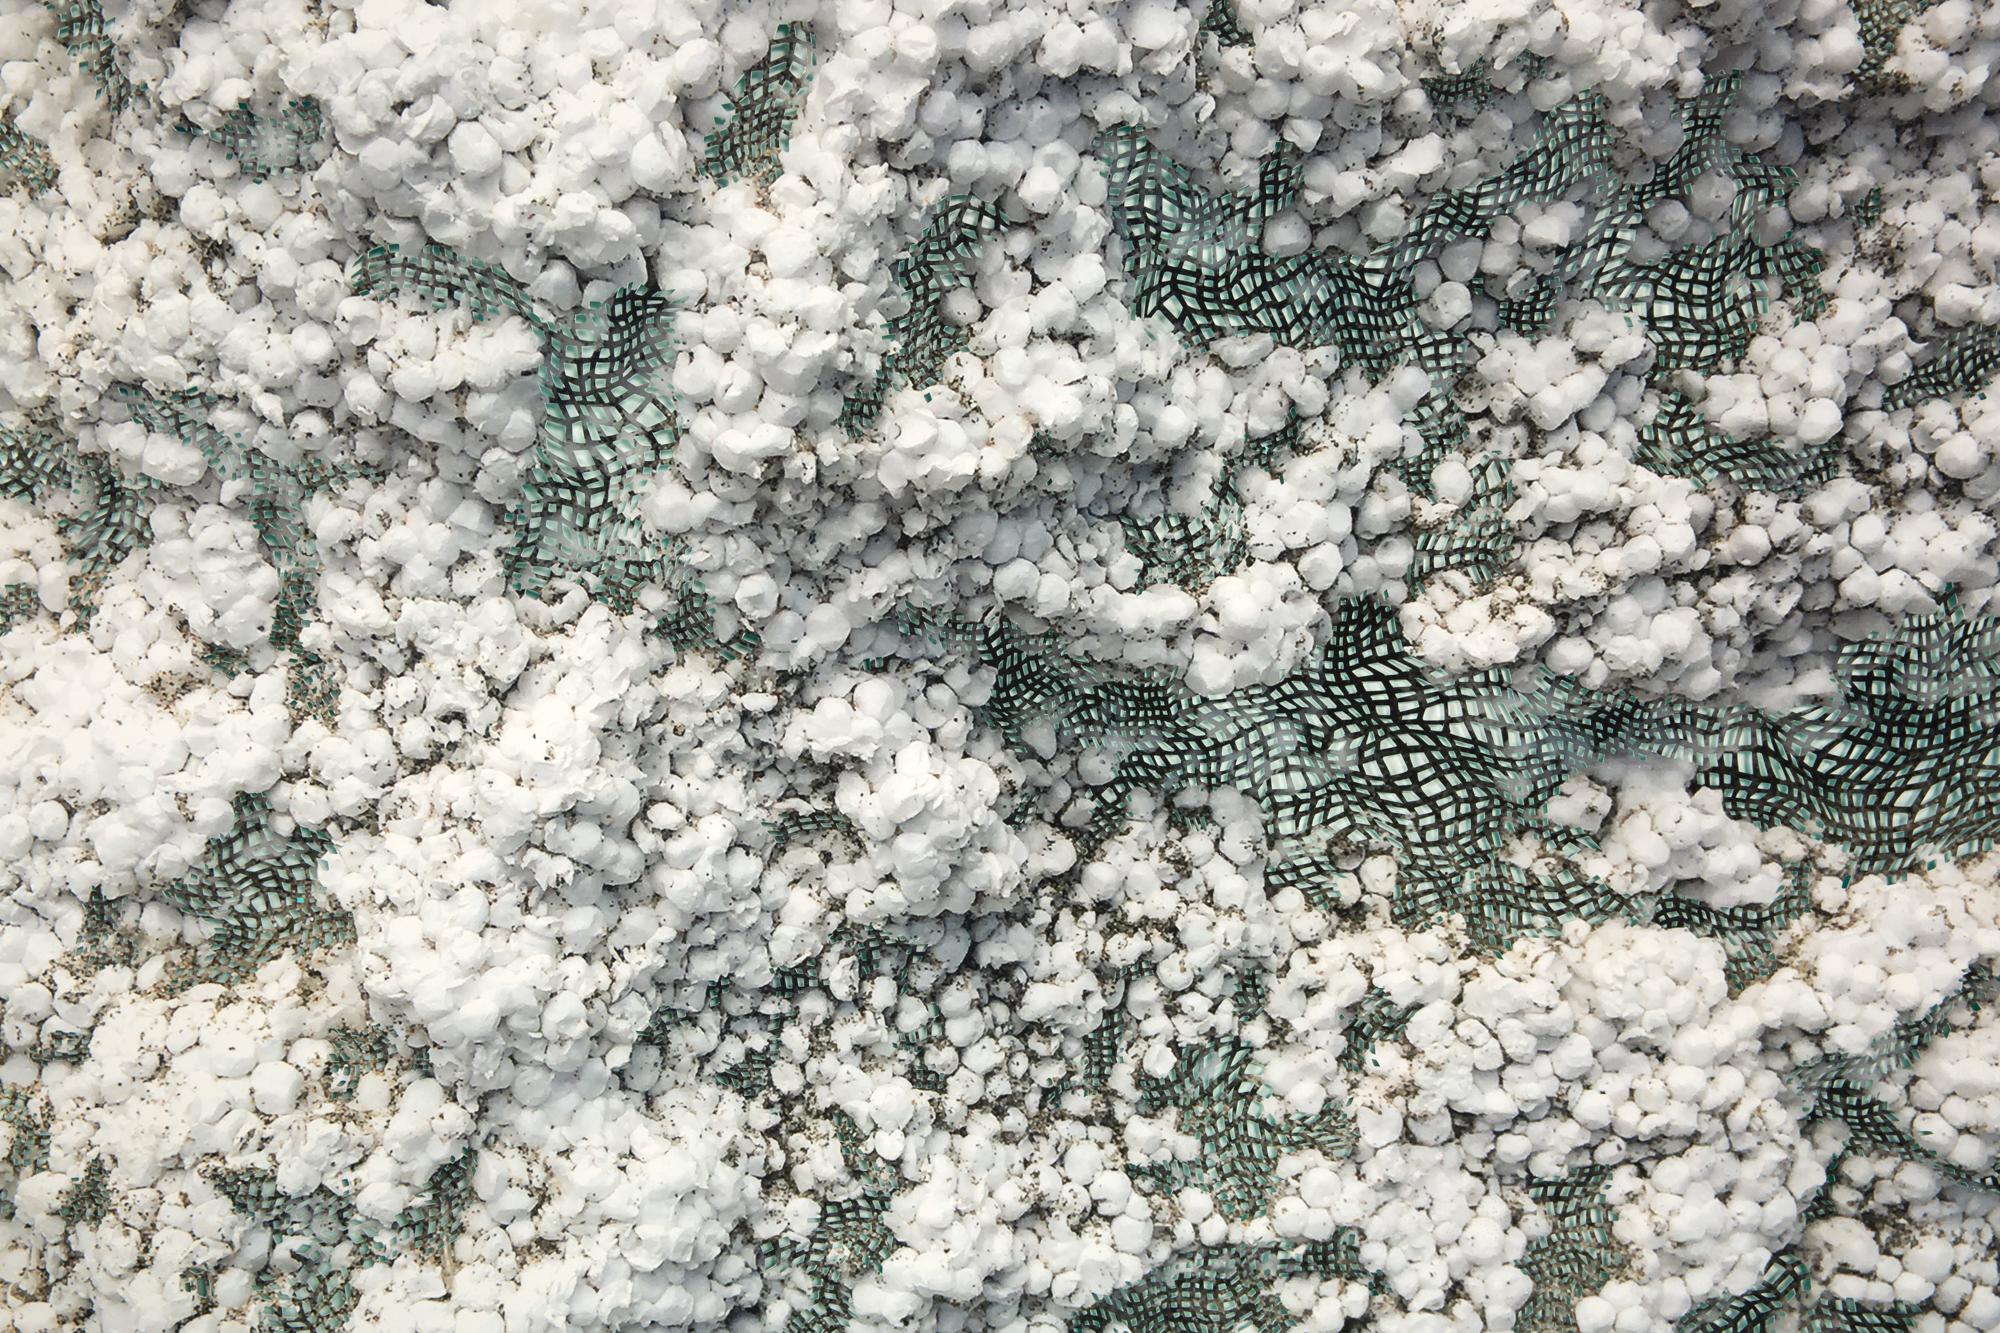 Matter (styrofoam), detail